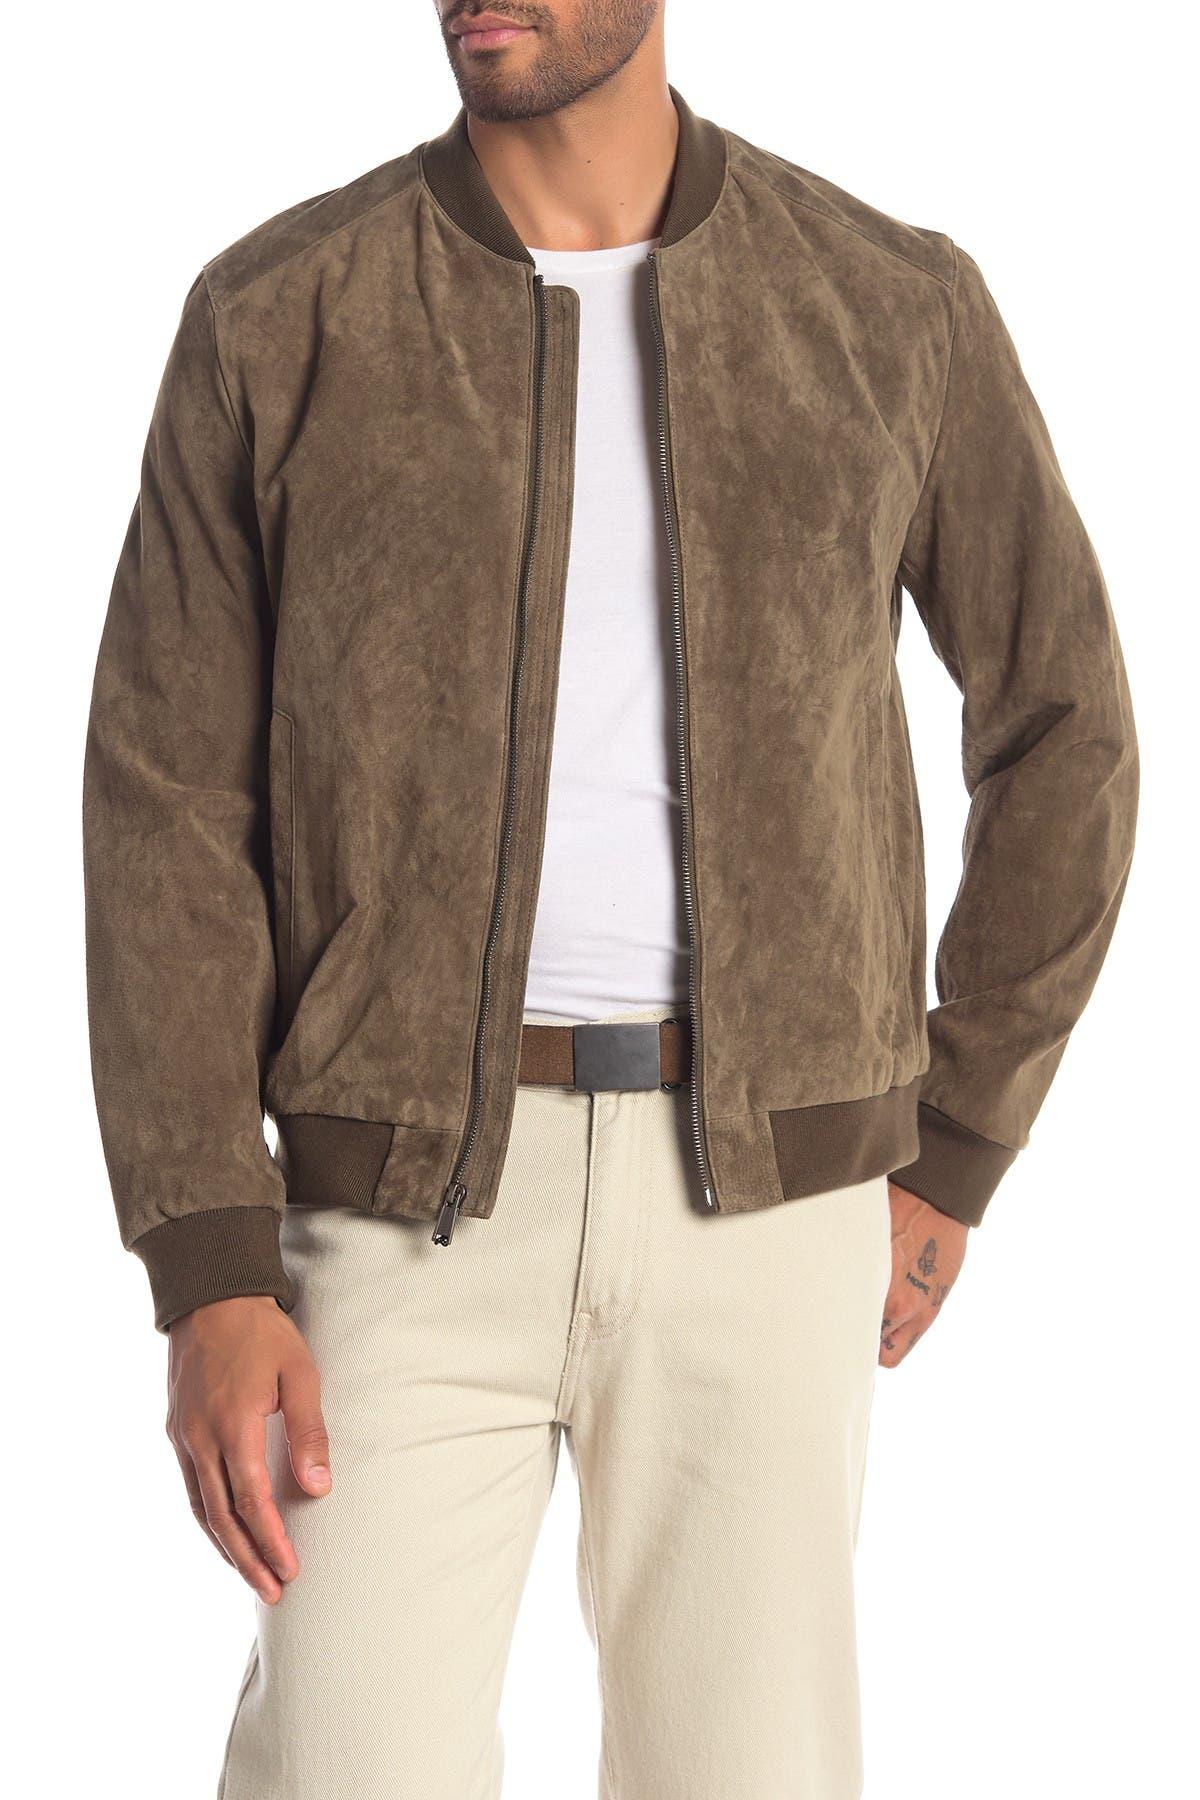 Image of Cole Haan Suede Varsity Jacket